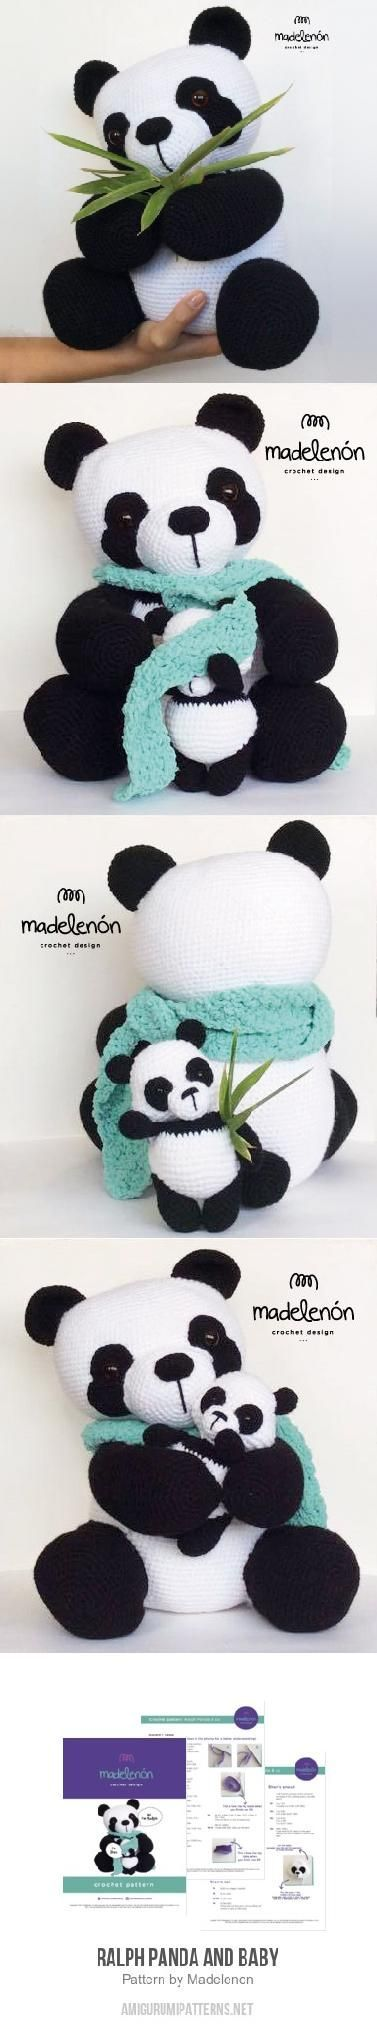 Ralph Panda and Baby amigurumi pattern by Madelenon ...